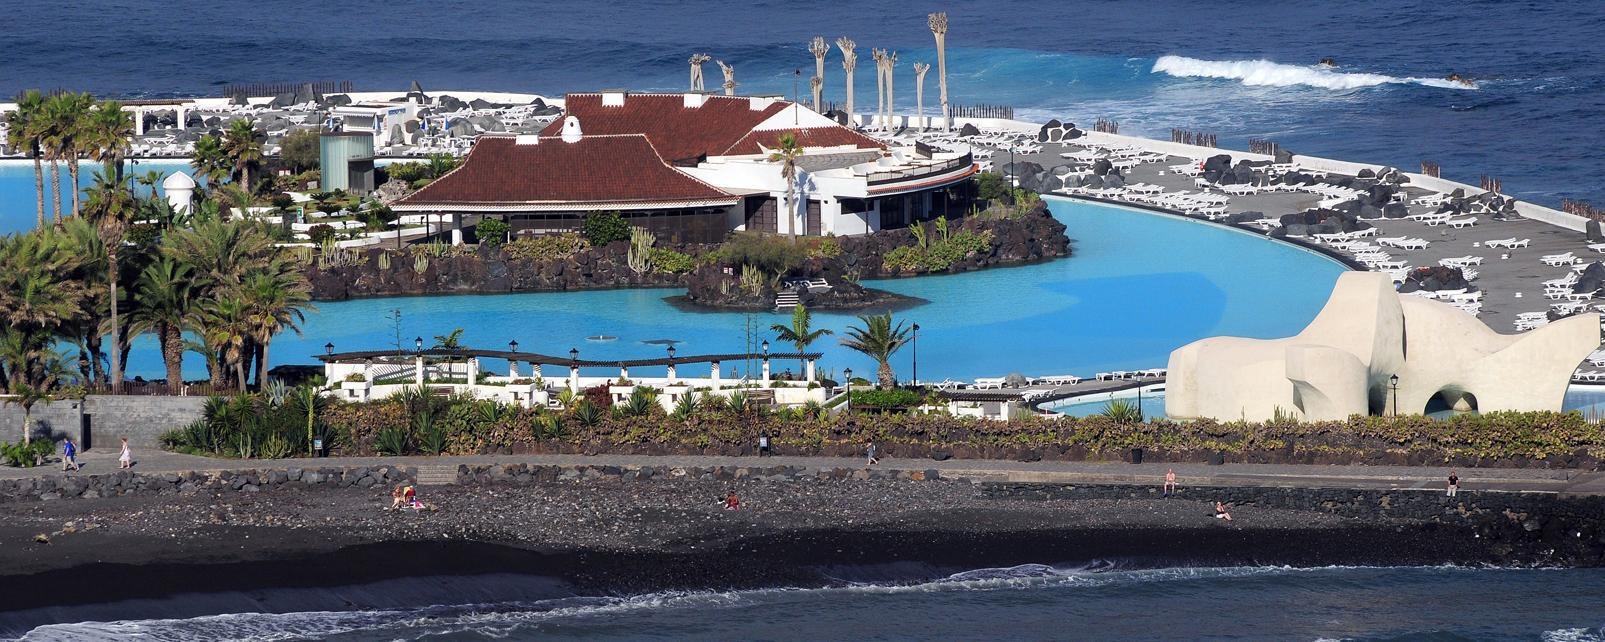 Hotel Tenerife Playa Puerto De La Cruz